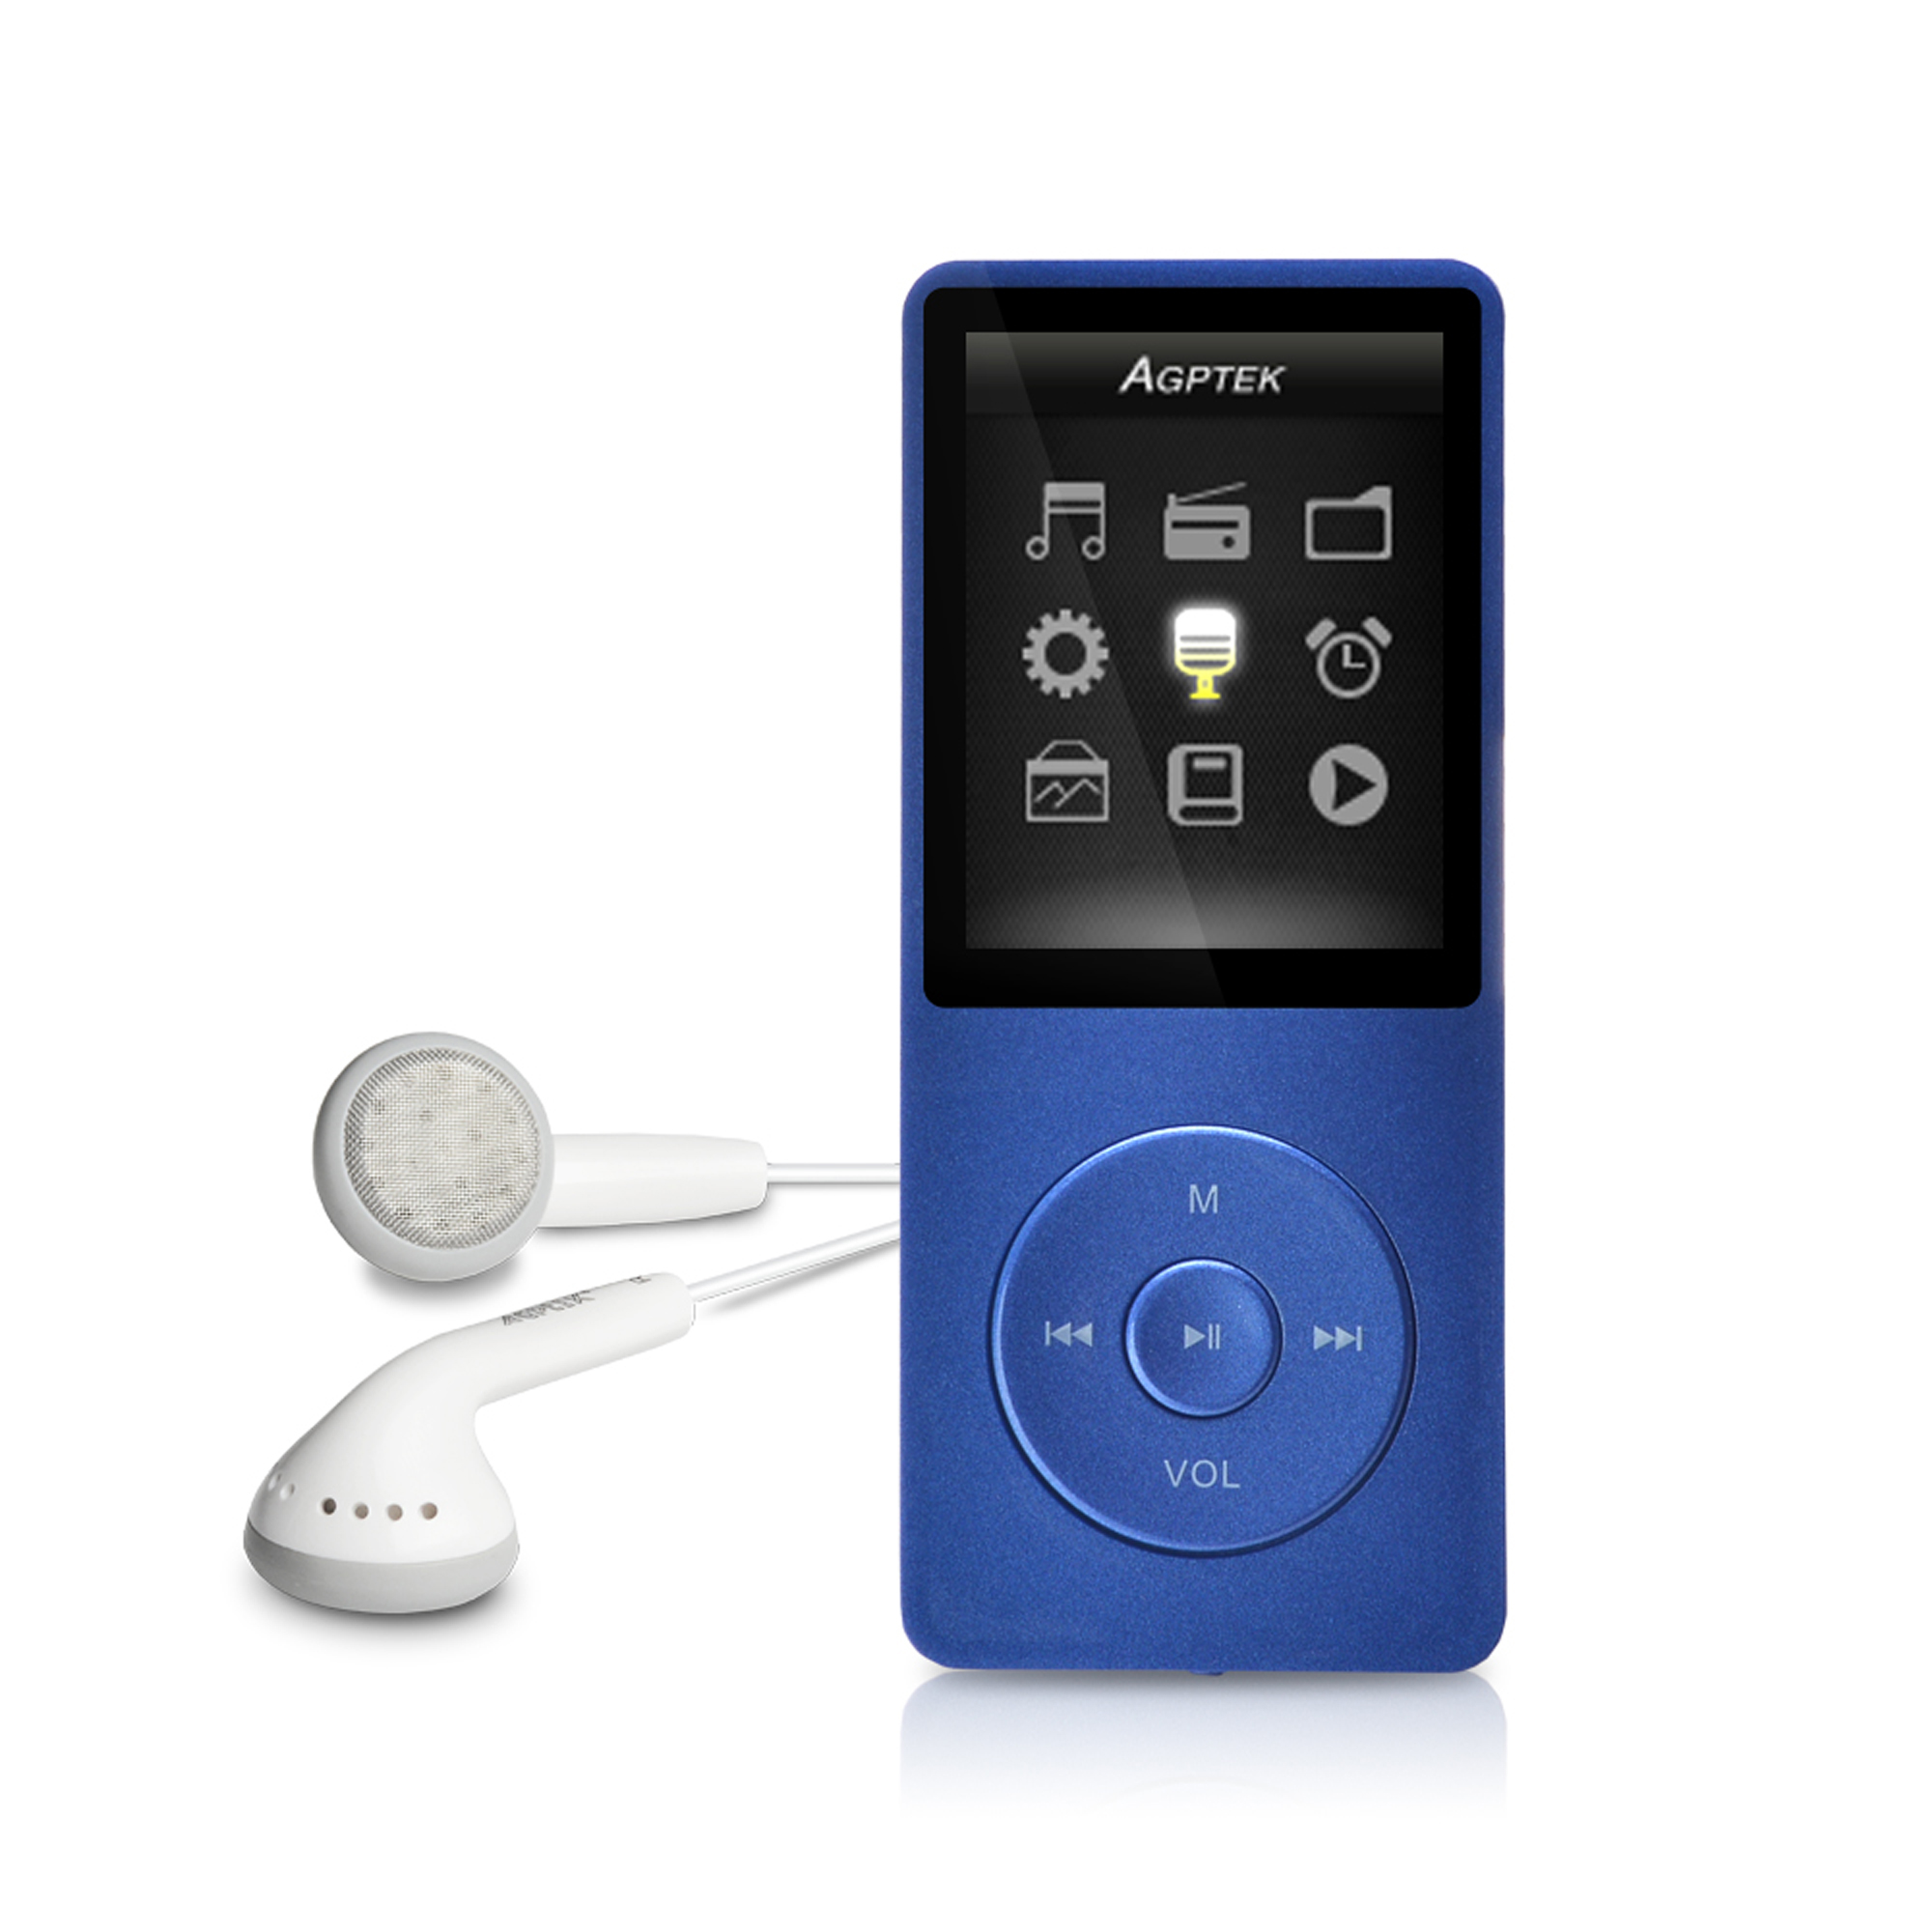 Agptek 8gb Lossless Sound Mp3 Player Entry Level Hi Fi Music Player